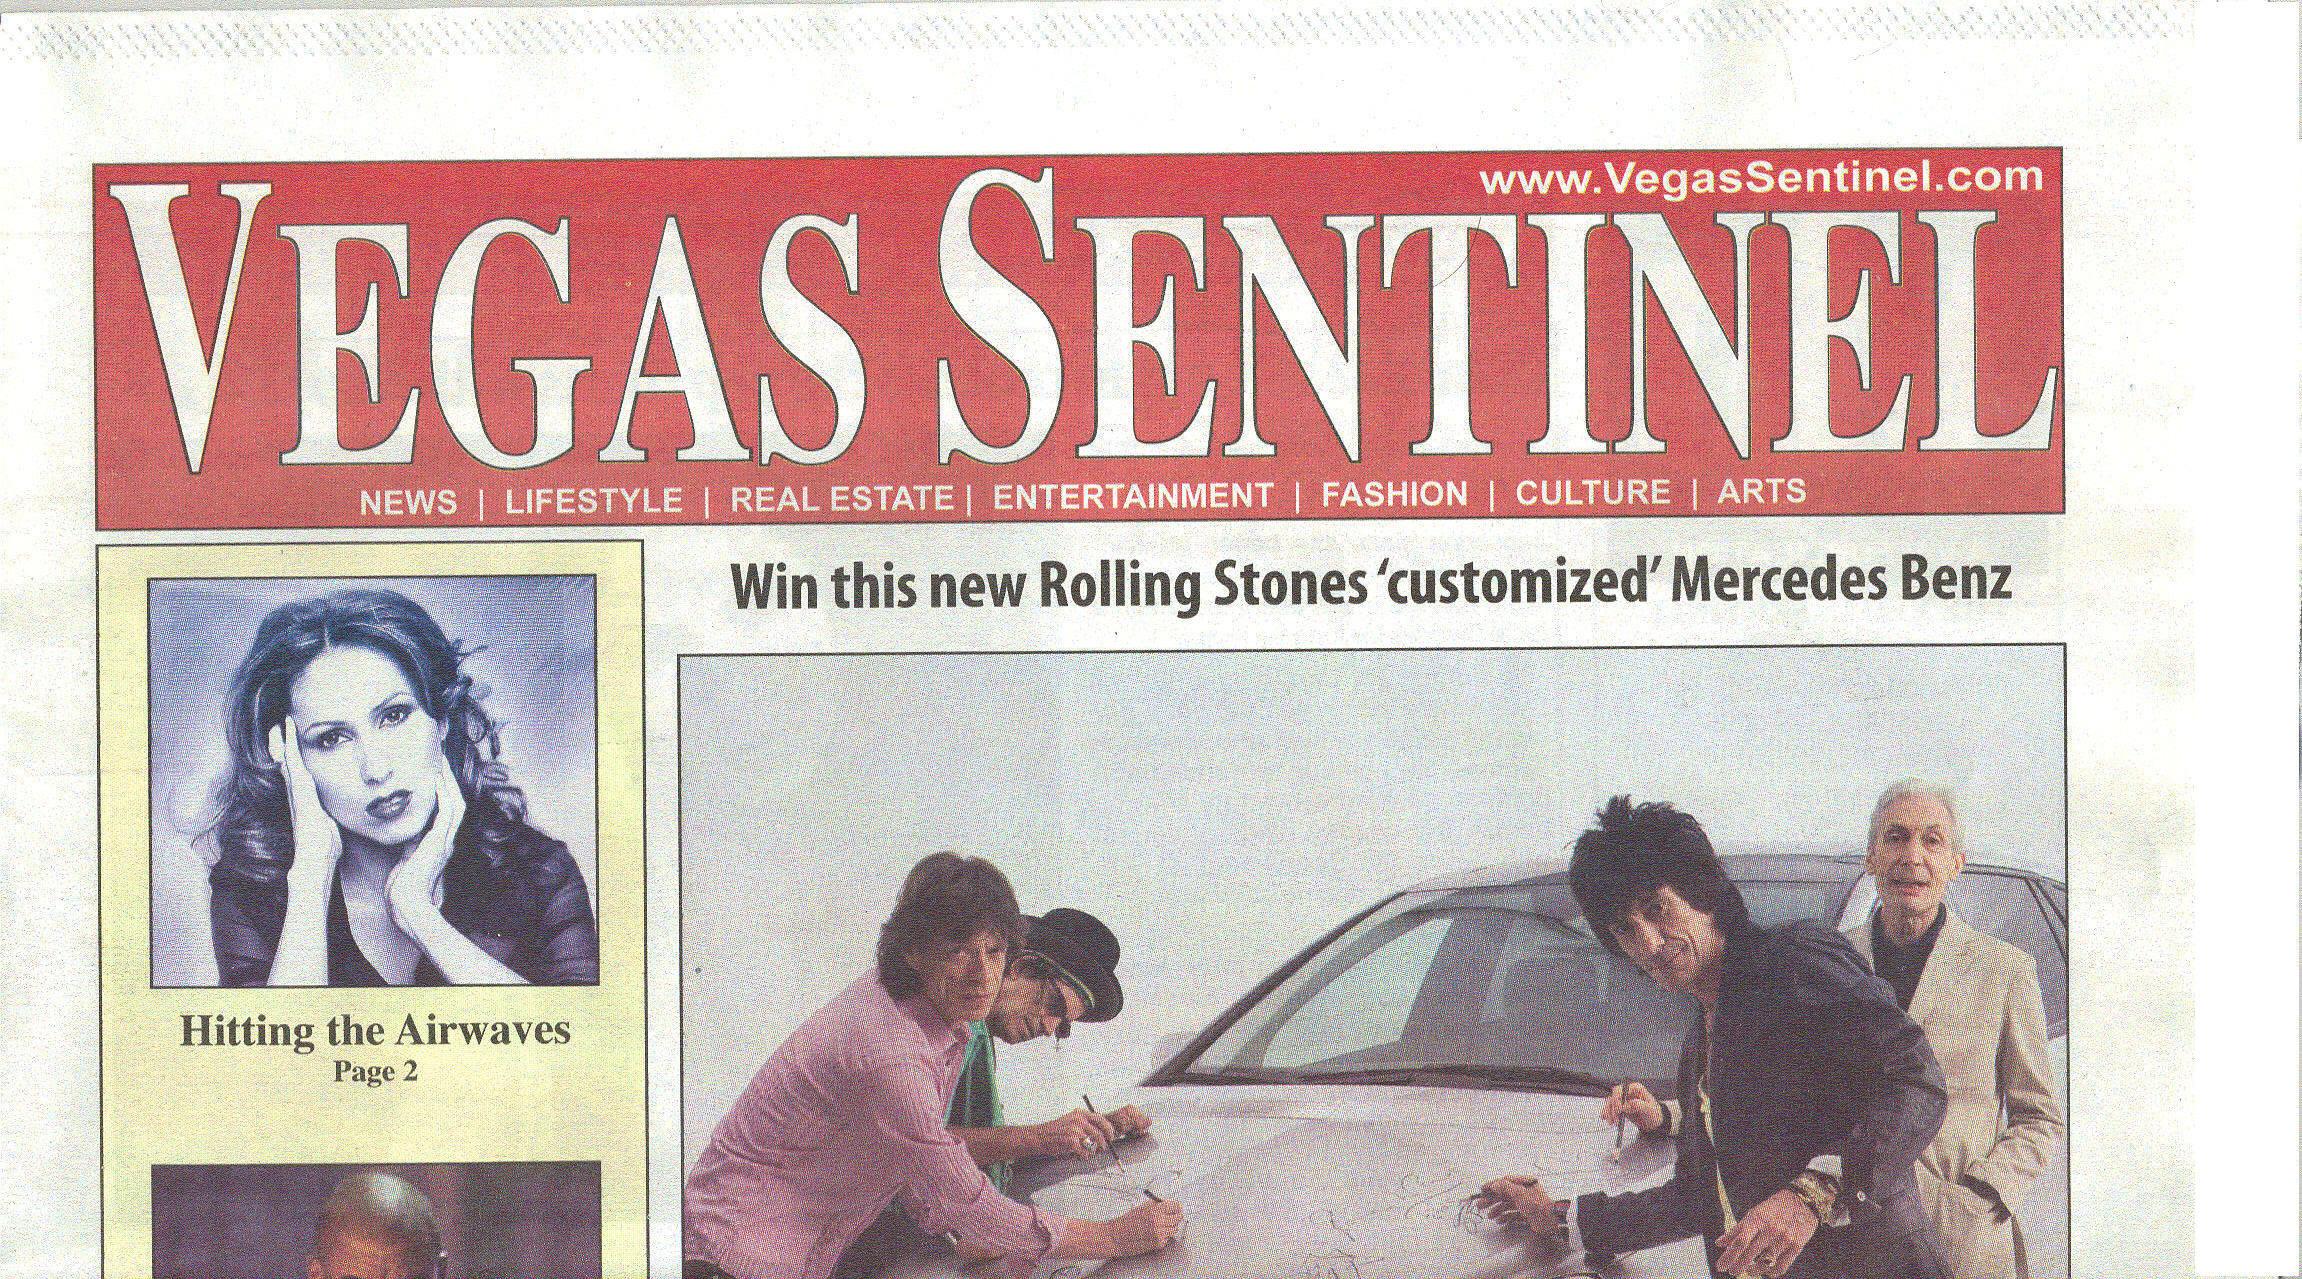 Las Vegas Sentinel